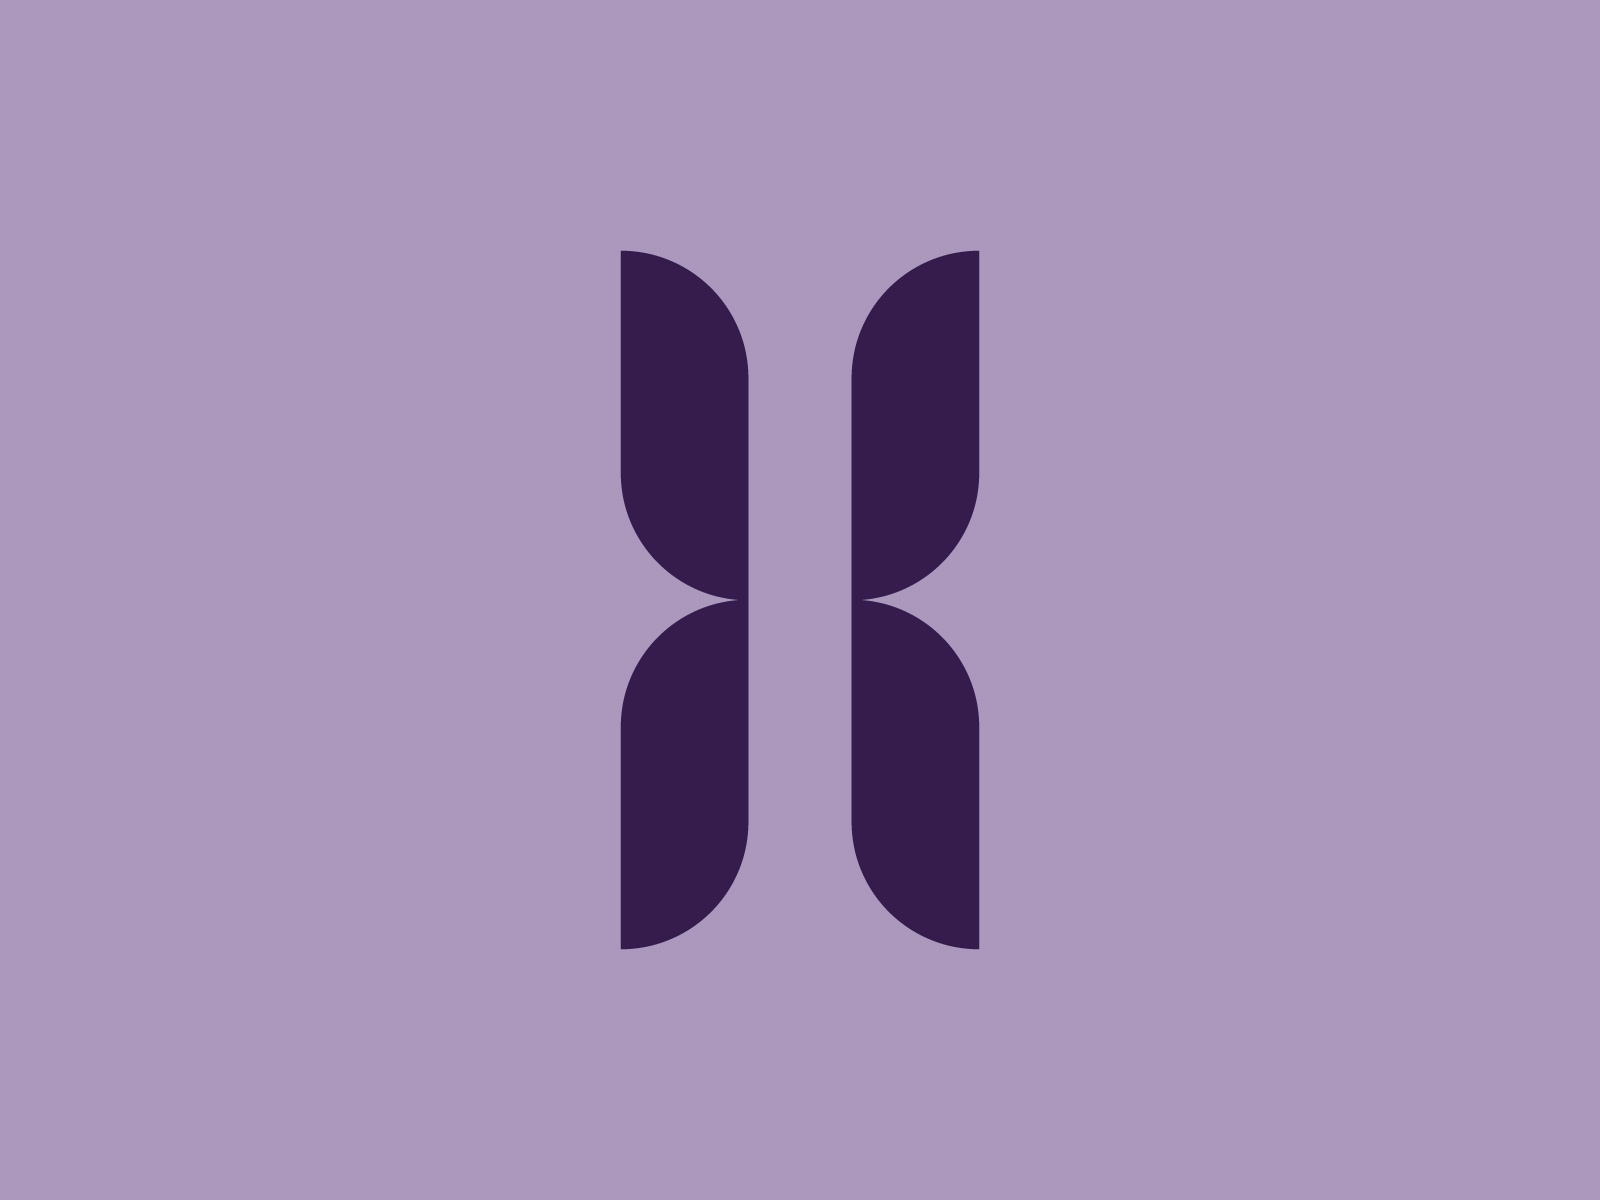 La liviu avasiloiei logo h